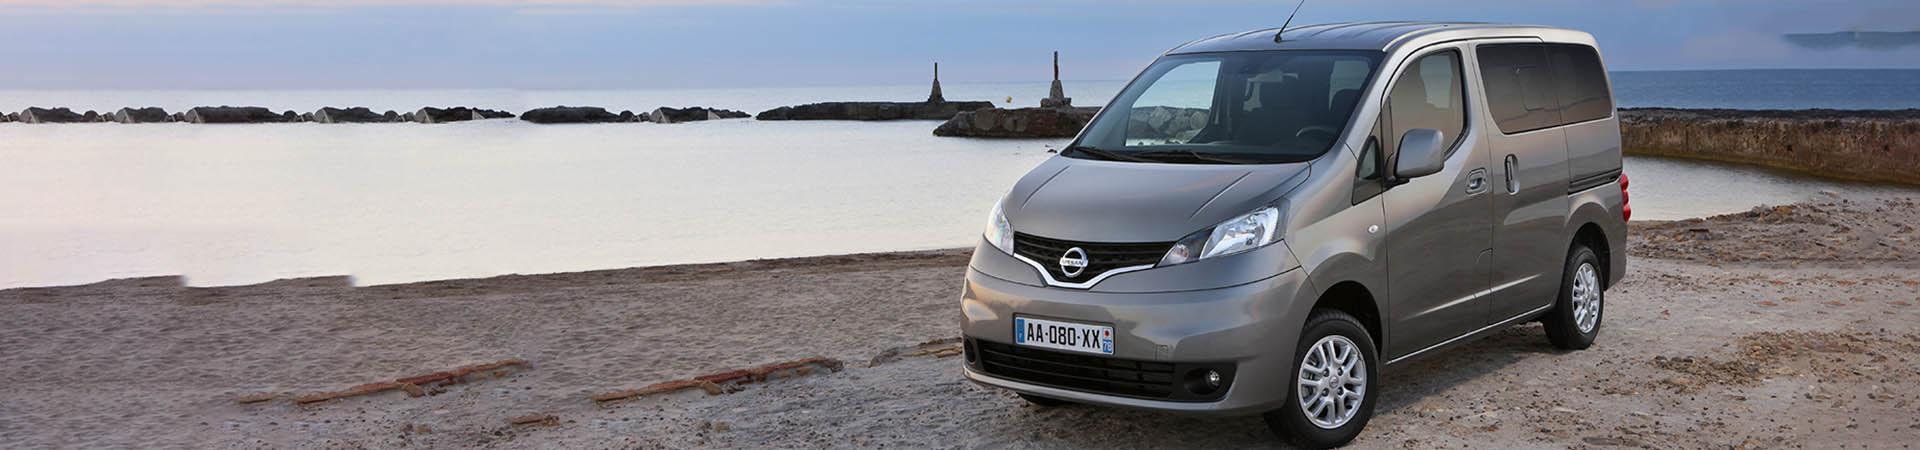 Nissan Evalia Tageszulassung